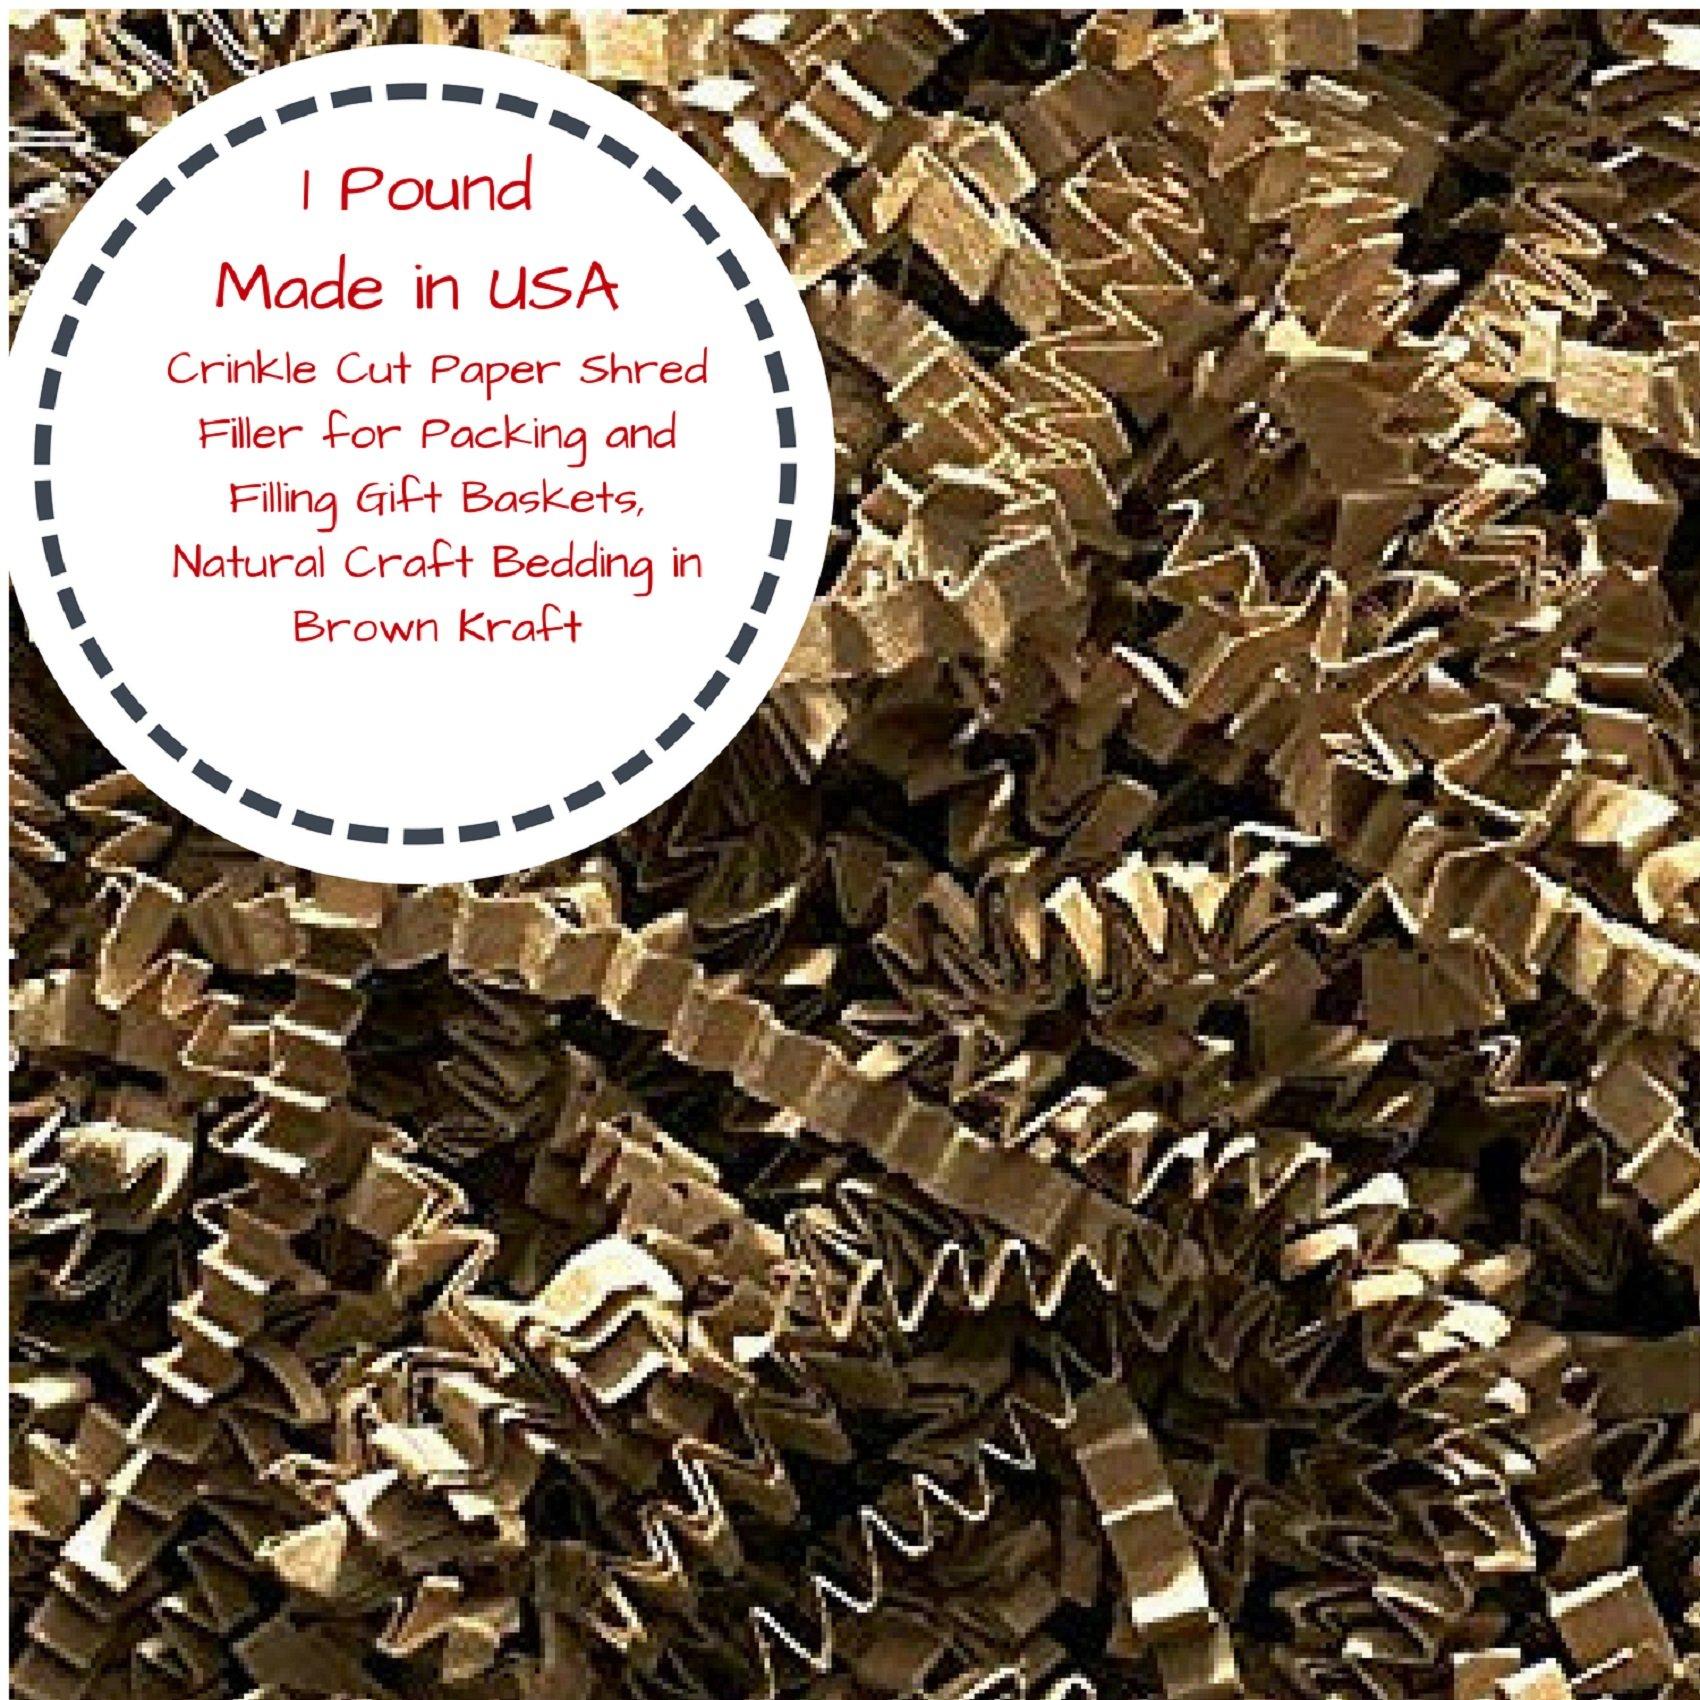 Crinkle Cut Paper Shred Filler for Packing and Filling Gift Baskets, Natural Craft Bedding in Brown Kraft